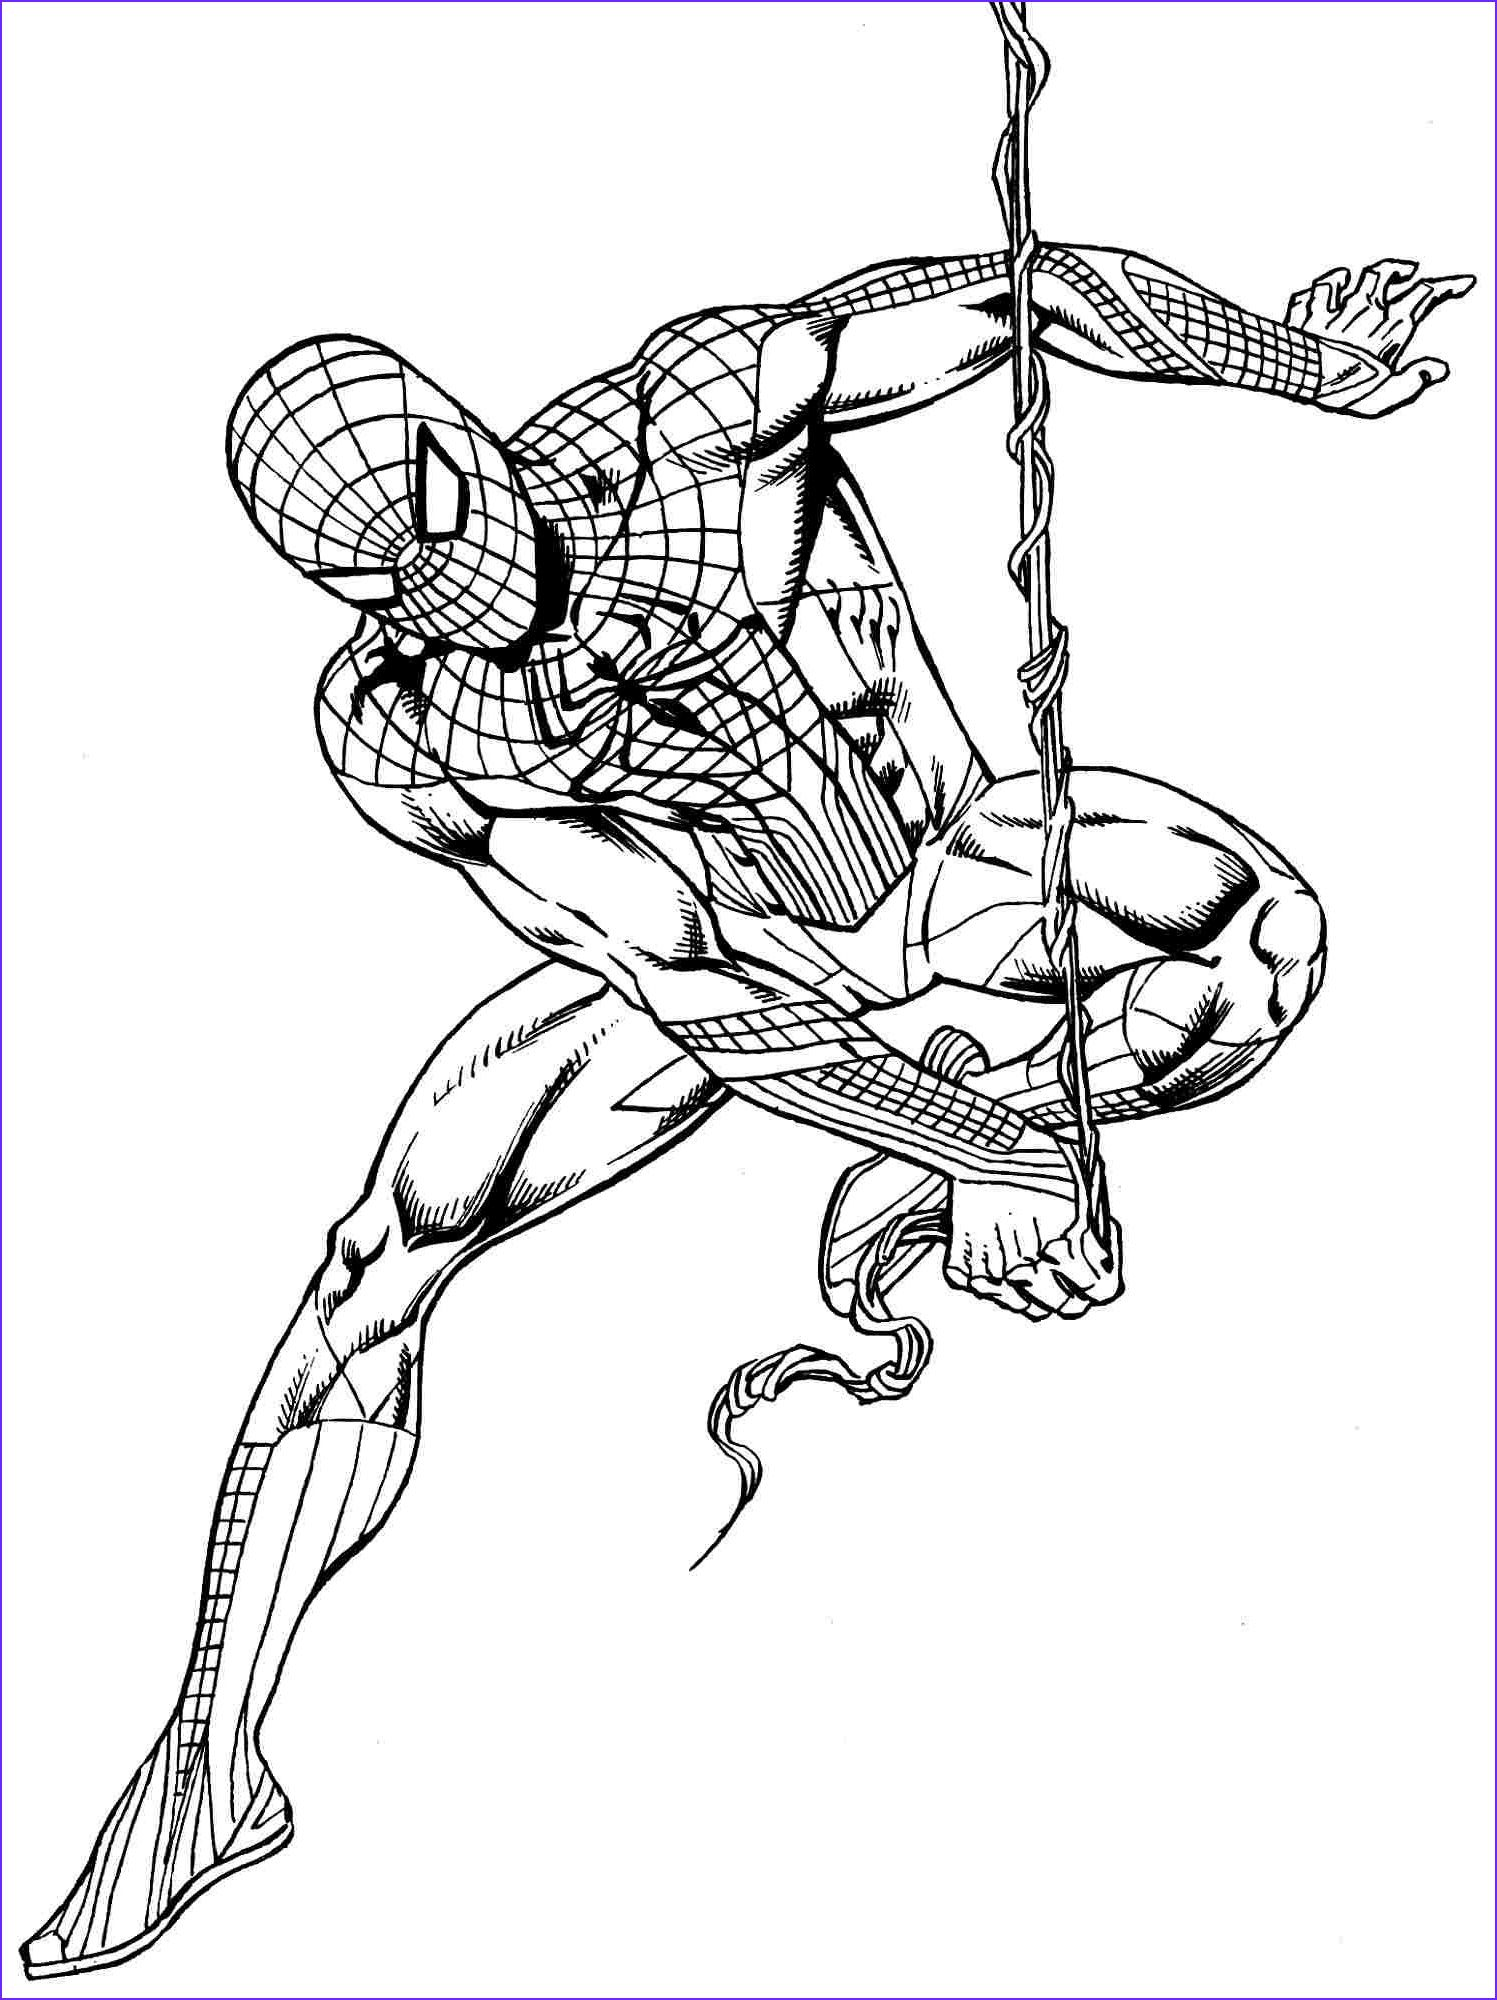 Coloring Superheroes Superhero Coloring Pages Superhero Free